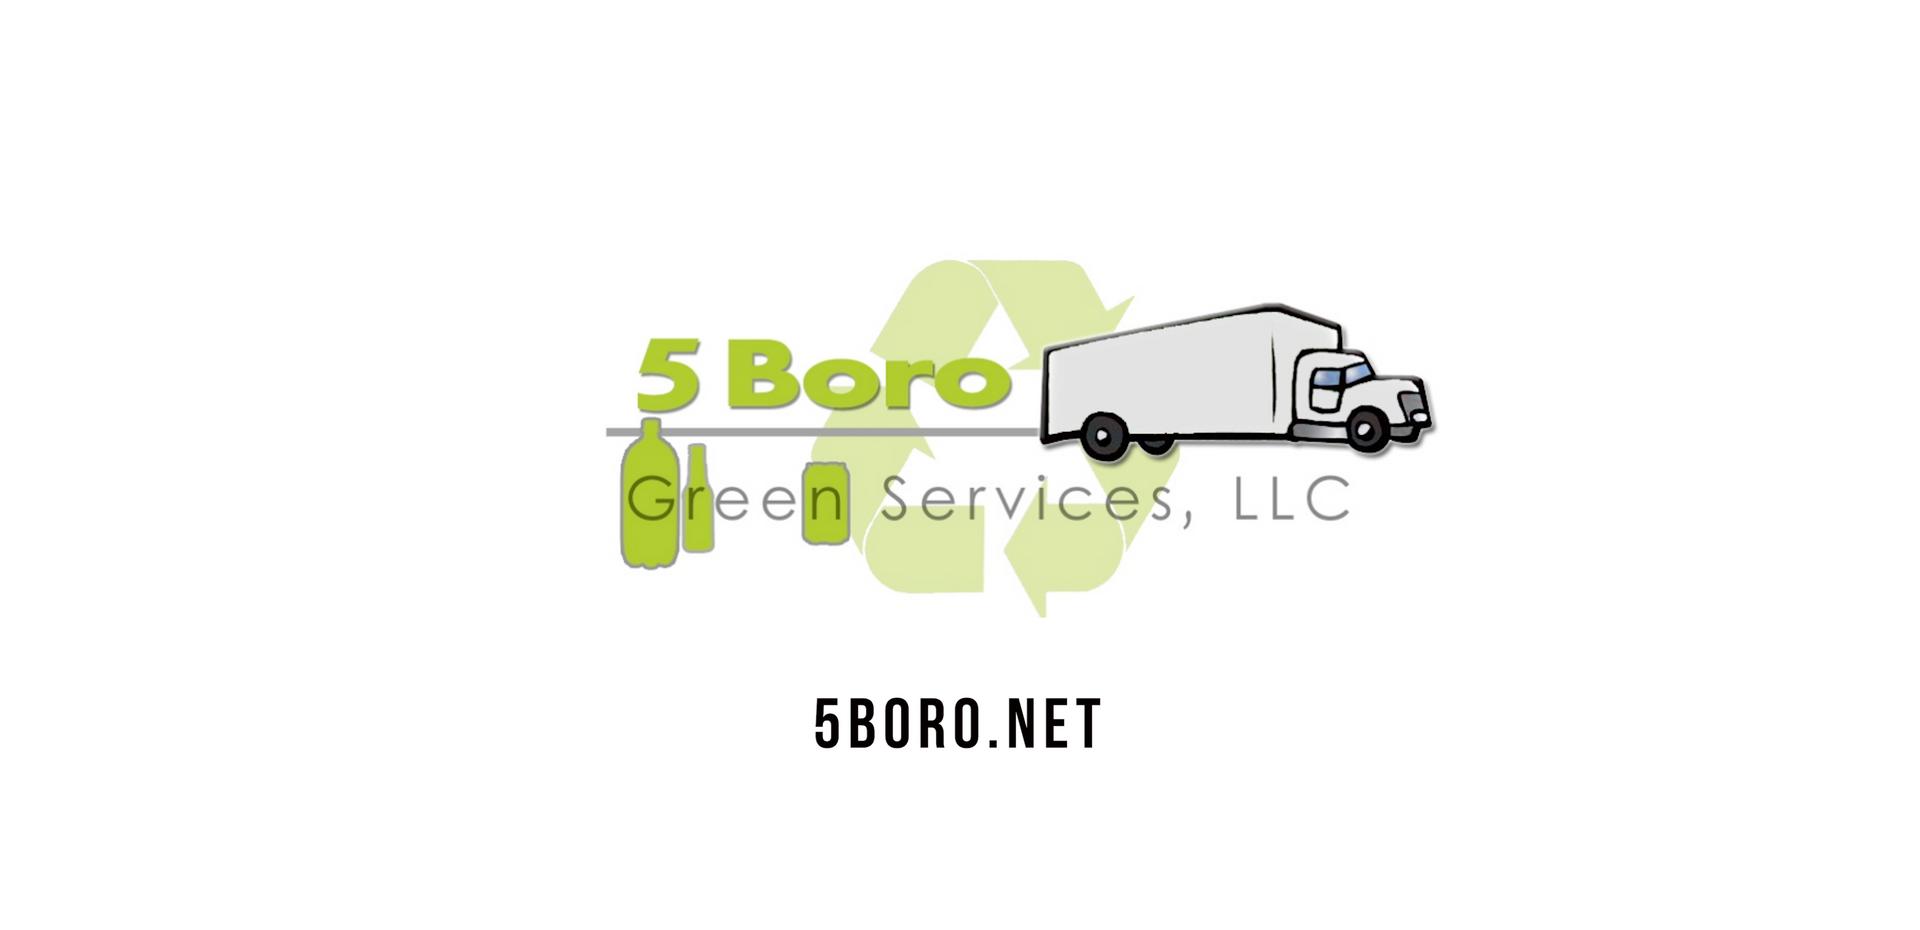 5 Boro Green Services - Redemption